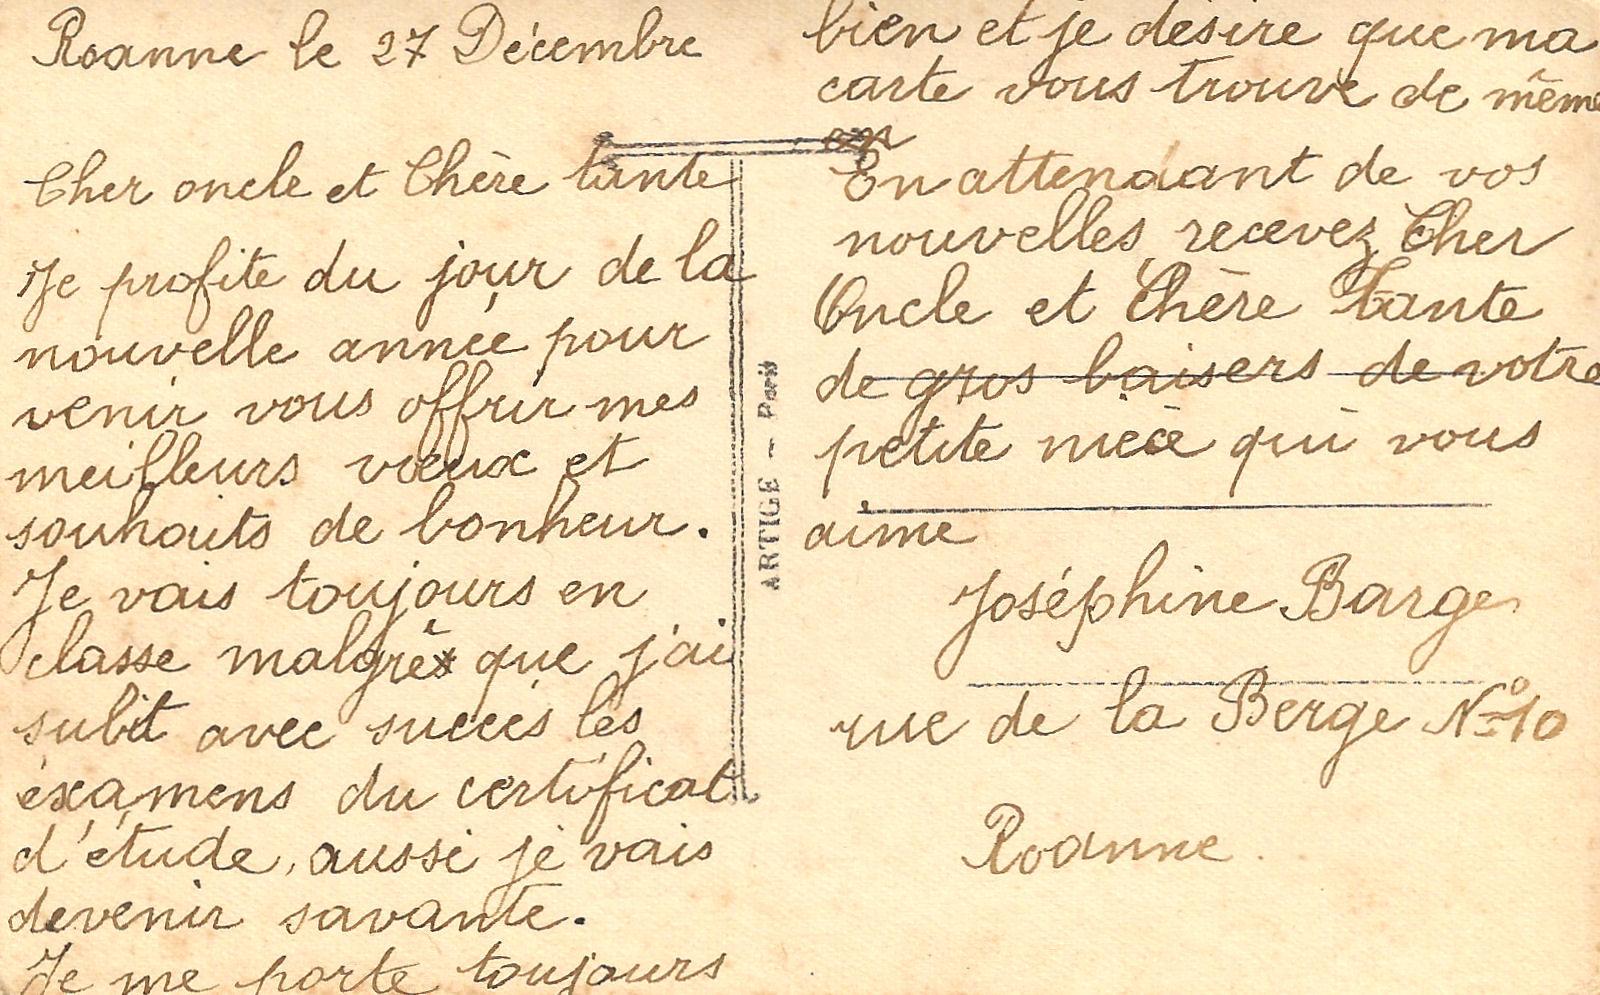 Italian handwritten postcard letter stock photo image 39254147 - Italian Handwritten Postcard Letter Stock Photo Image 1300x971 Antique